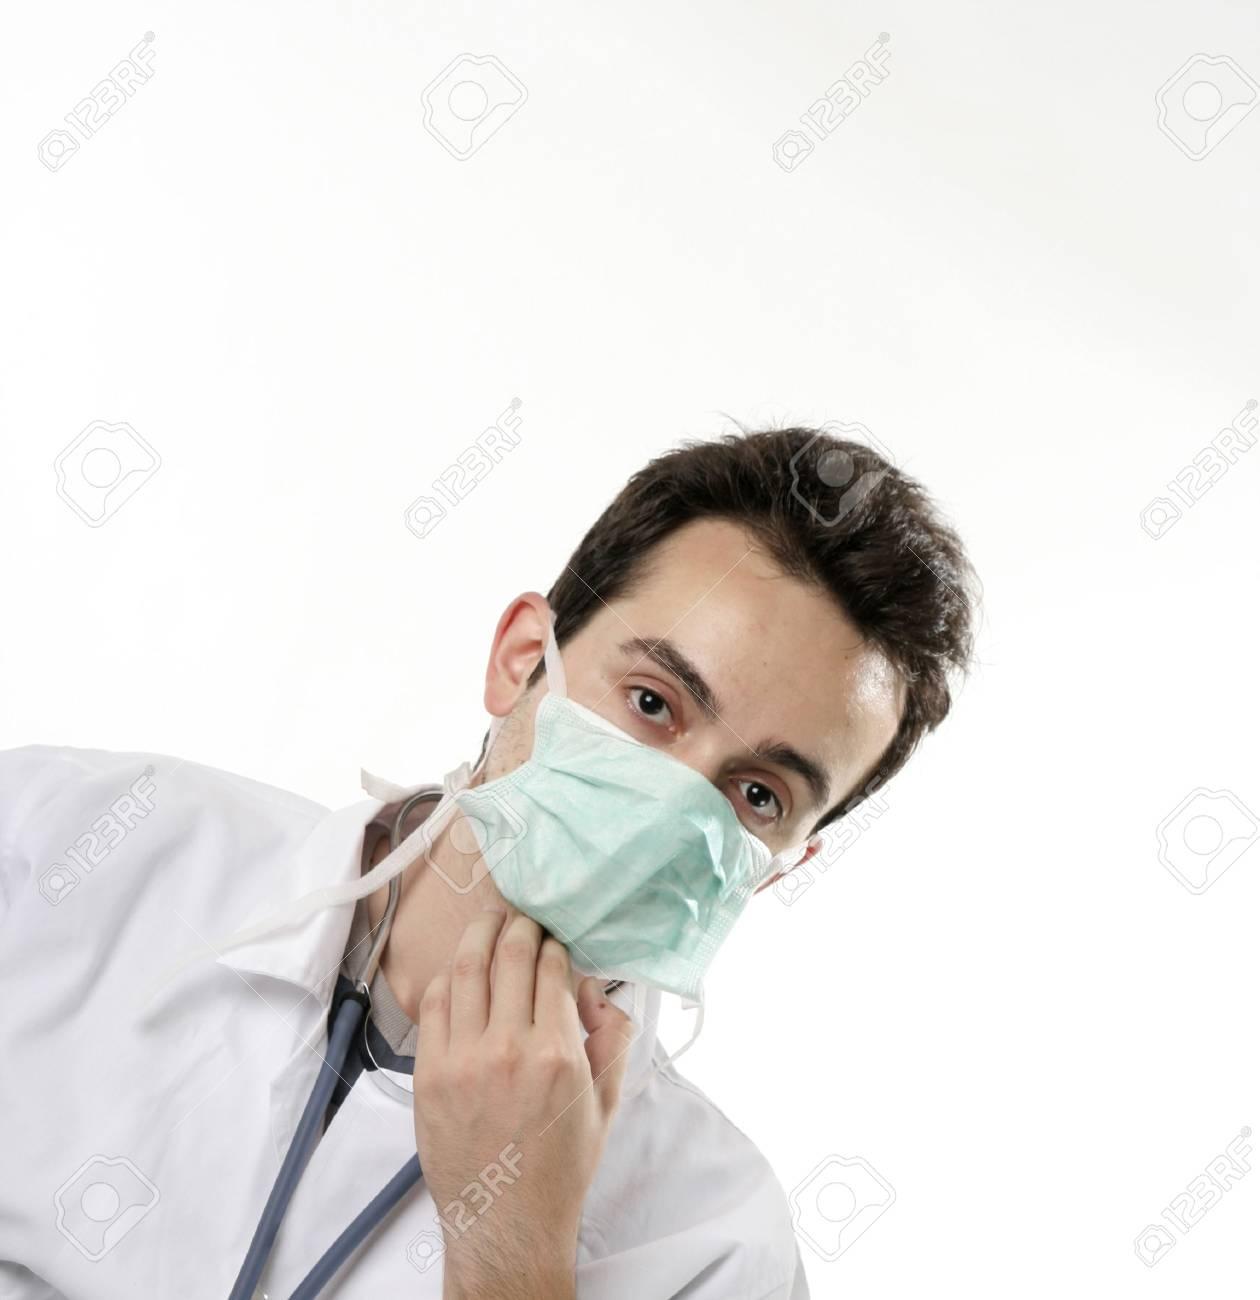 Closeup portrait of a doctor. Stock Photo - 5226847